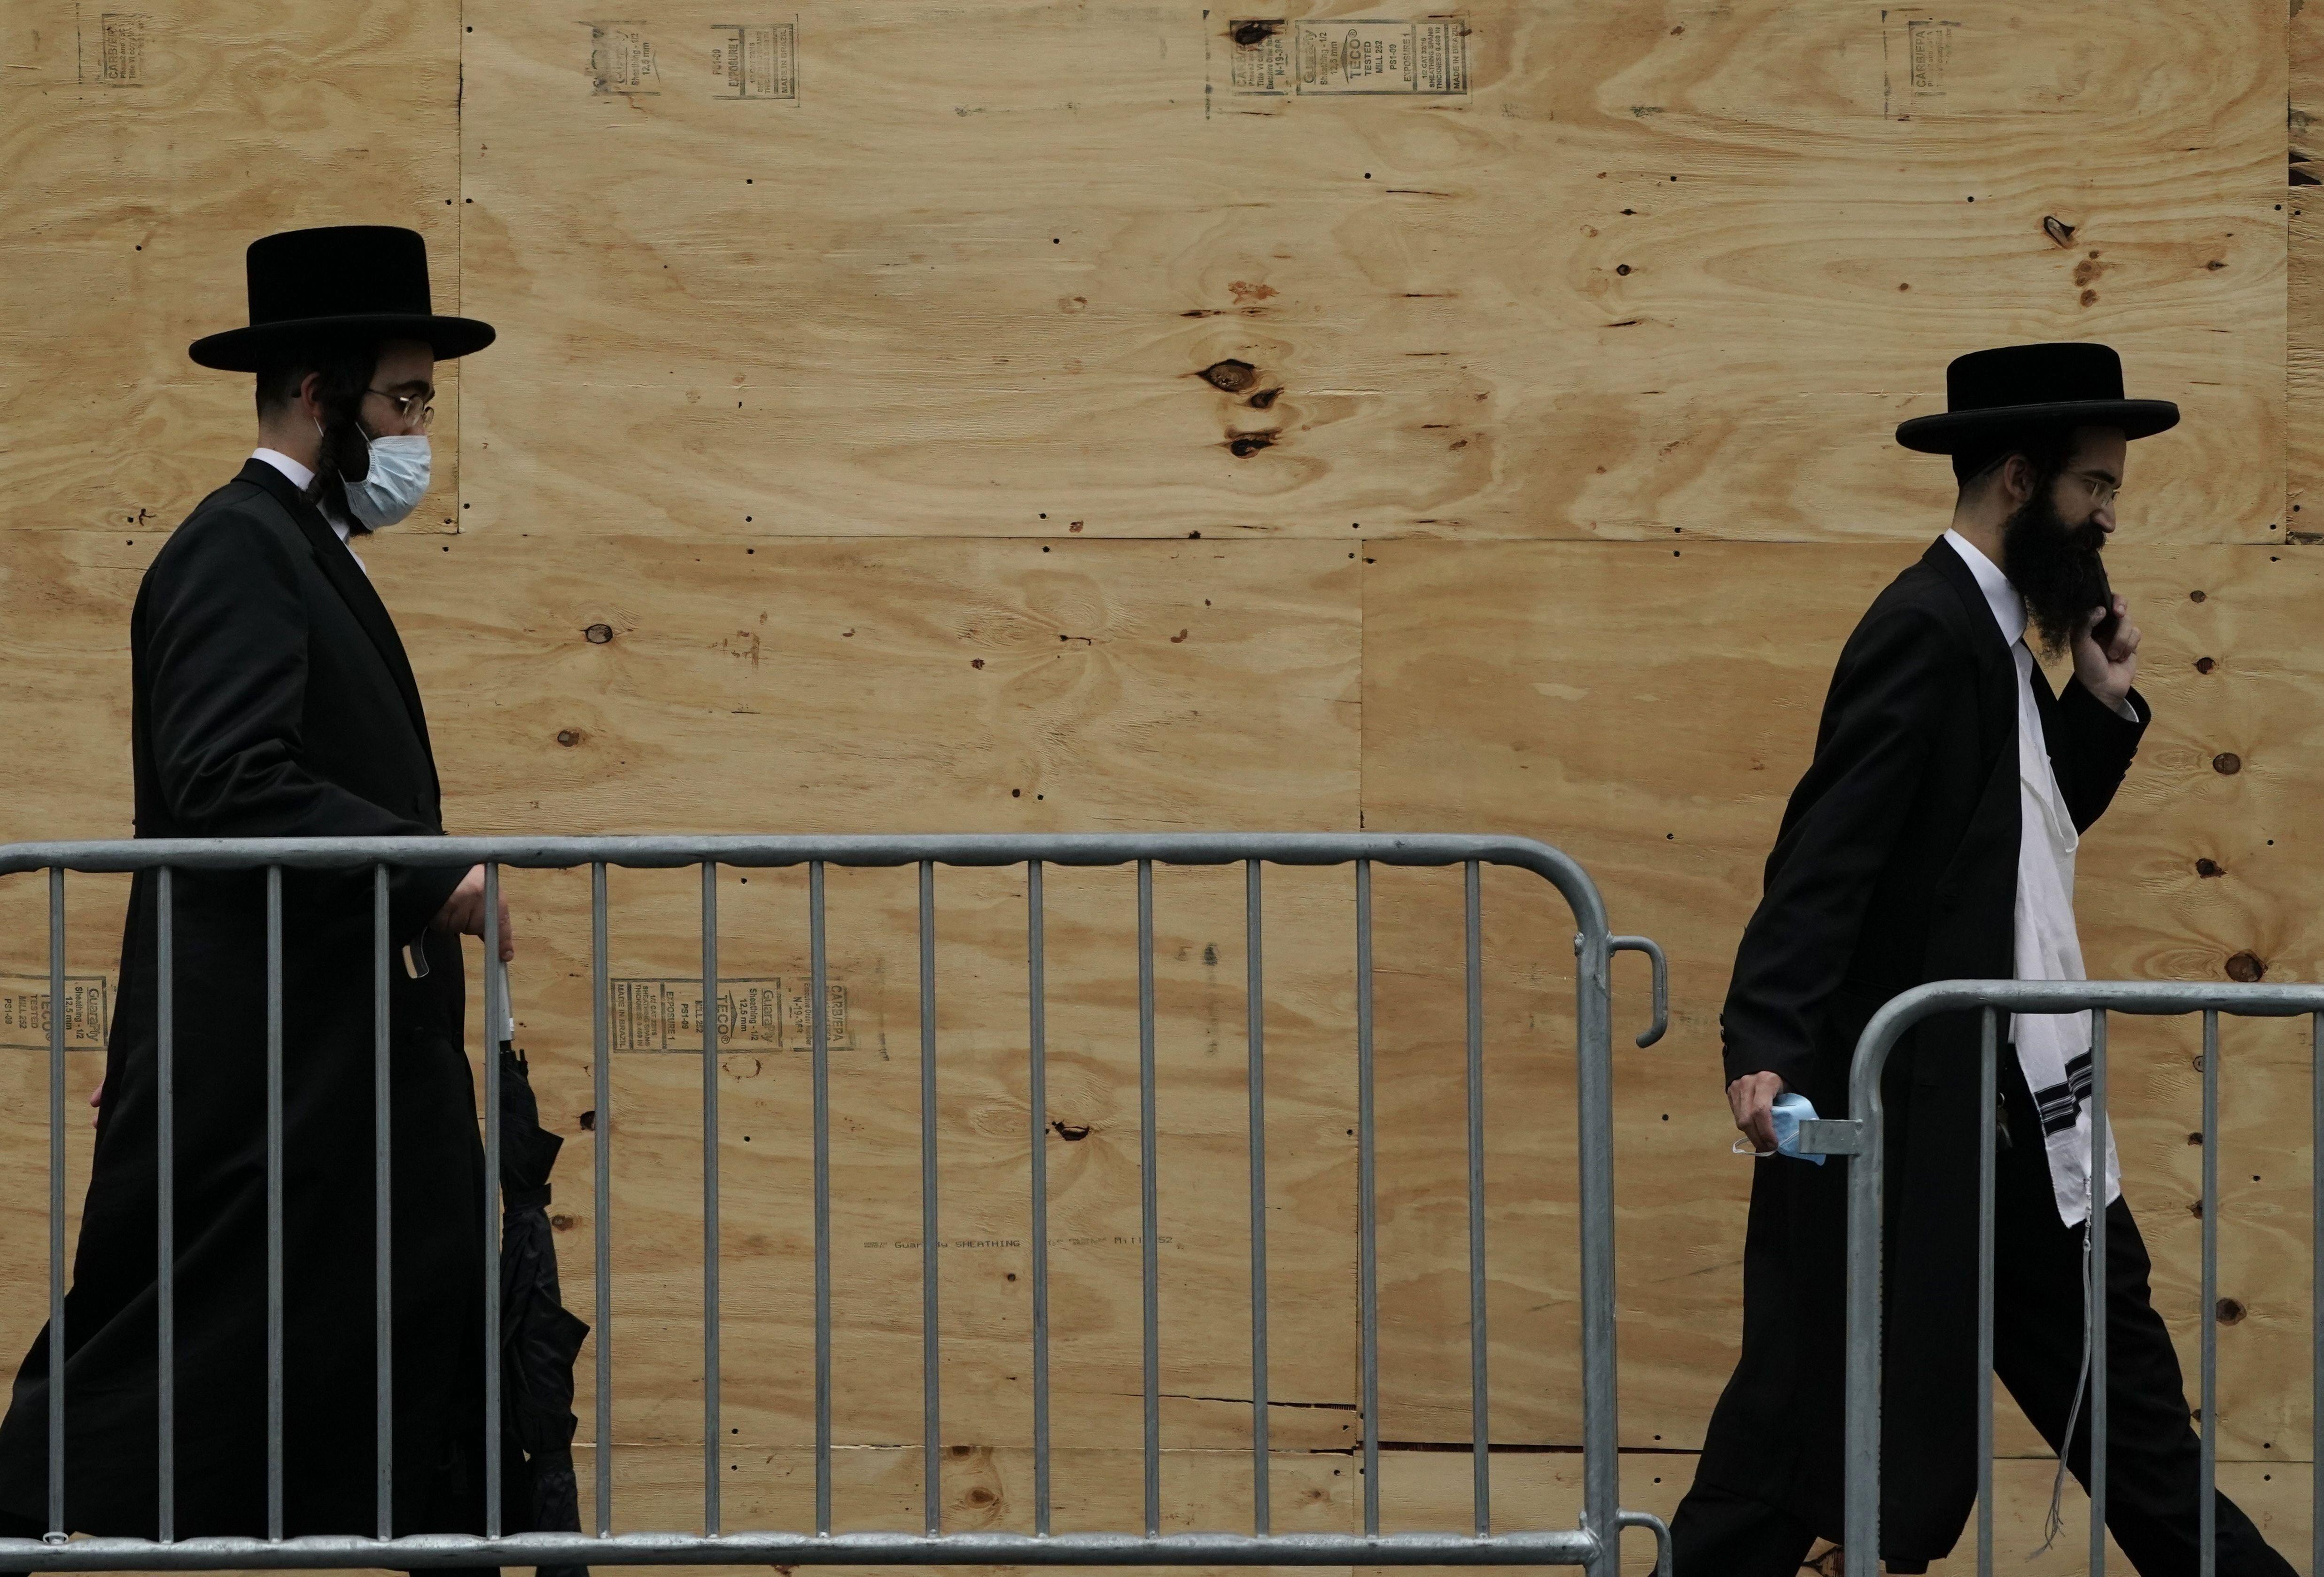 Orthodox Jewish men walk through a Brooklyn neighborhood on September 29, 2020, in New York.